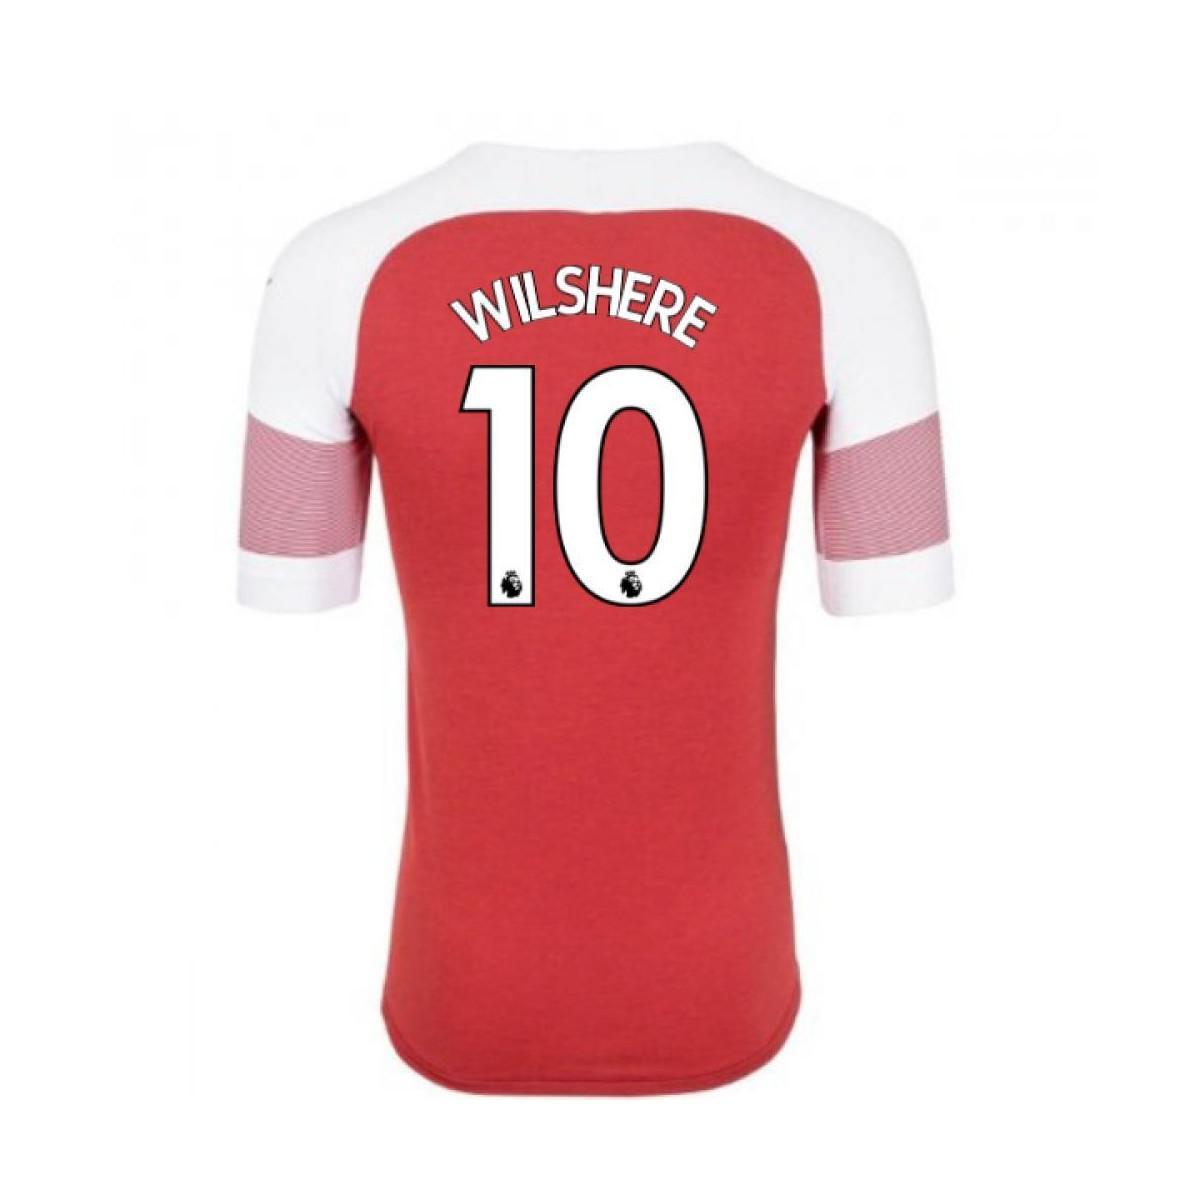 PUMA 2018-2019 Arsenal Home Football Shirt (wilshere 10) Men s T ... 46893b6fe